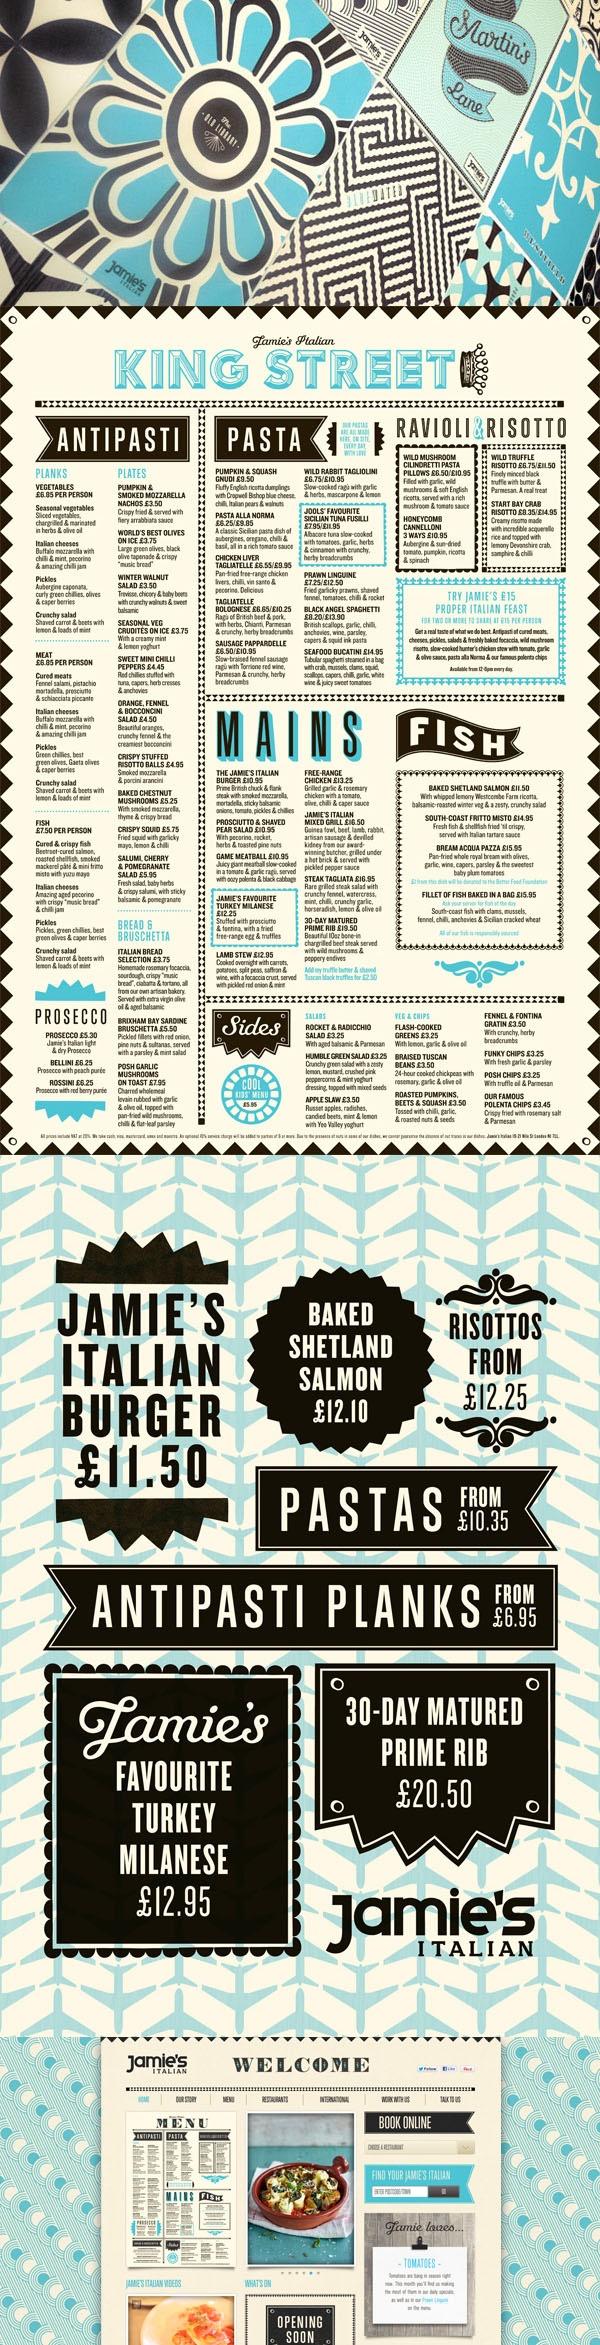 Jamie's Italian | Superfantastic | jamie oliver restaurant ★★★★★